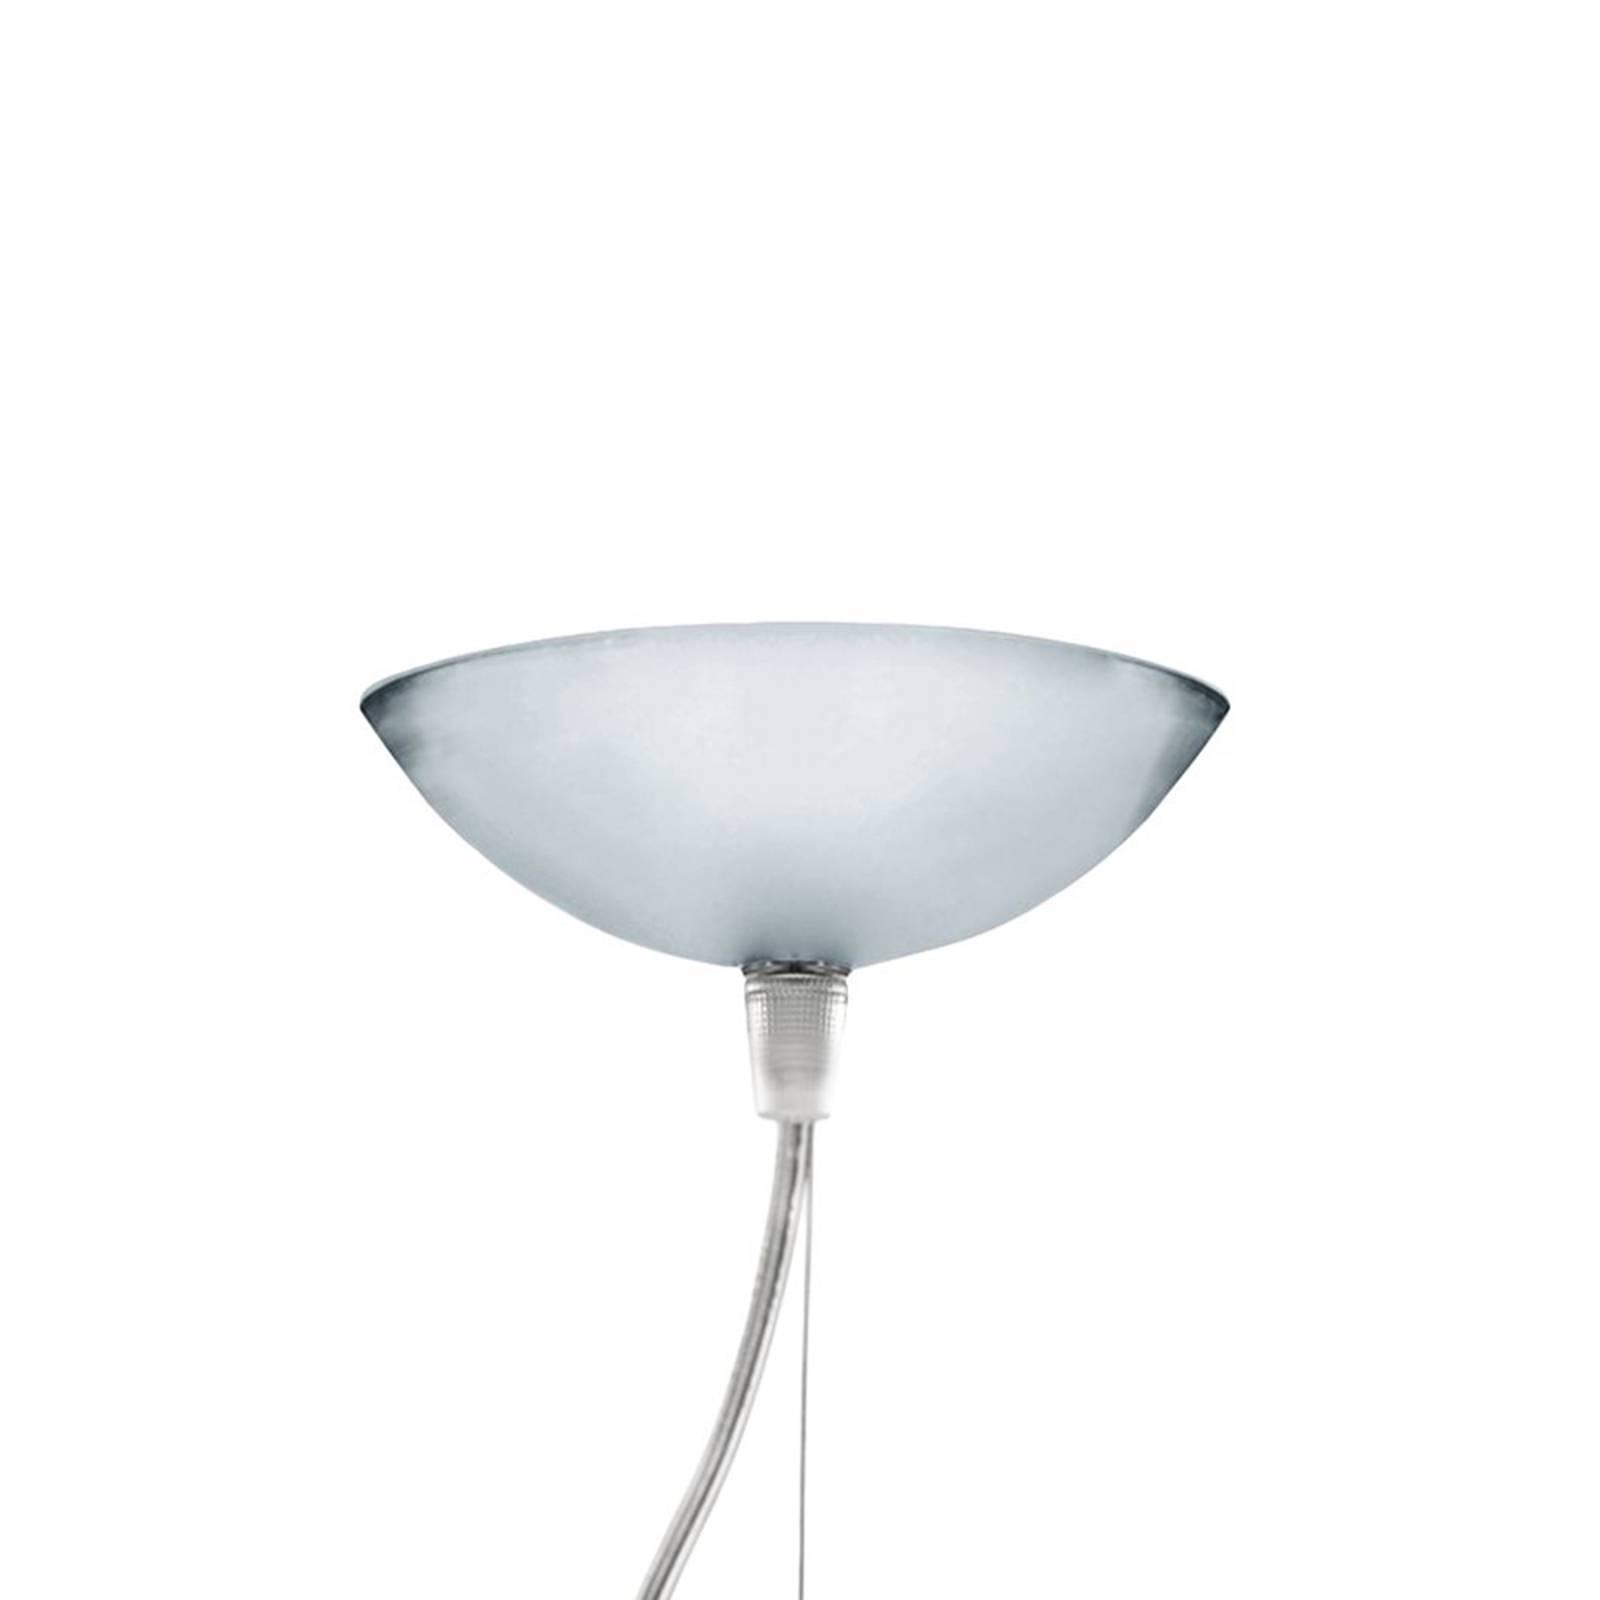 Kartell Small FL/Y LED-Hängeleuchte chrom